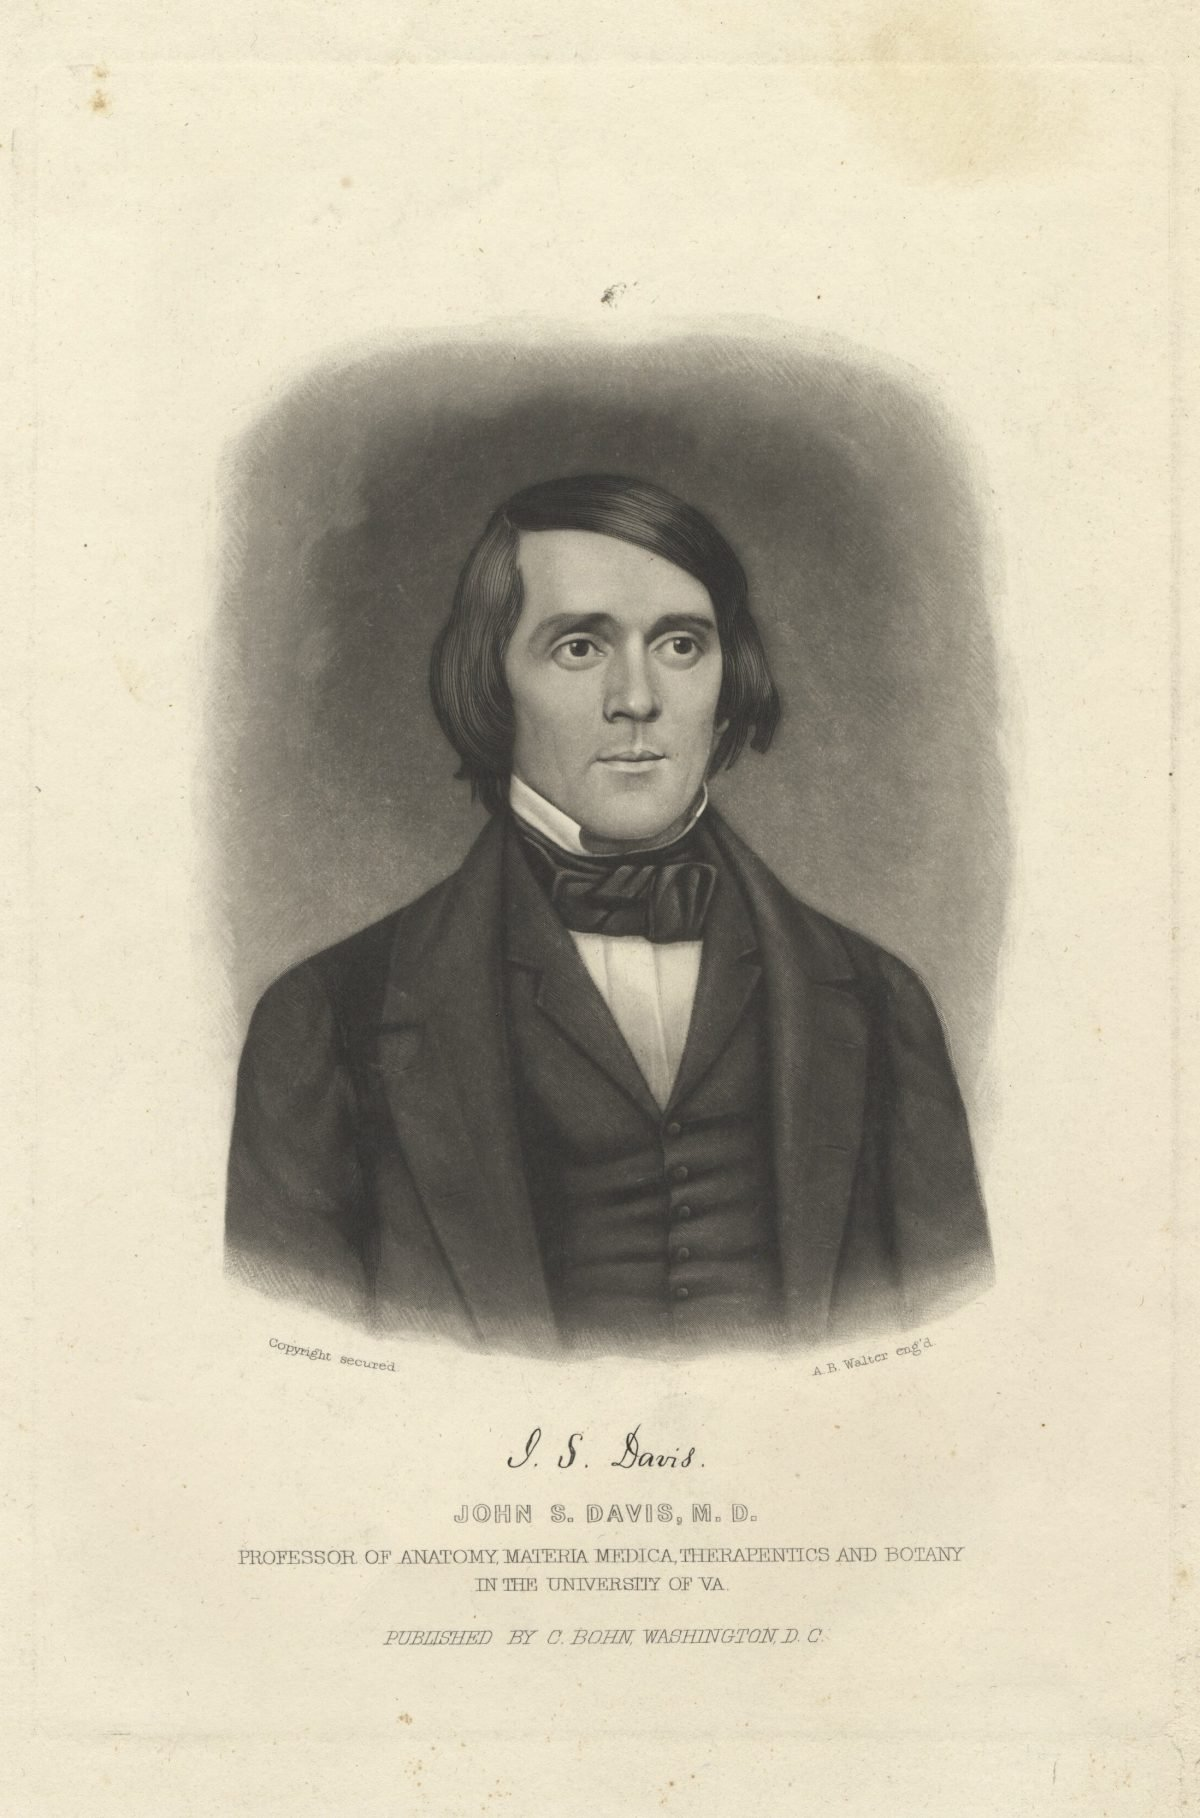 John Staige Davis